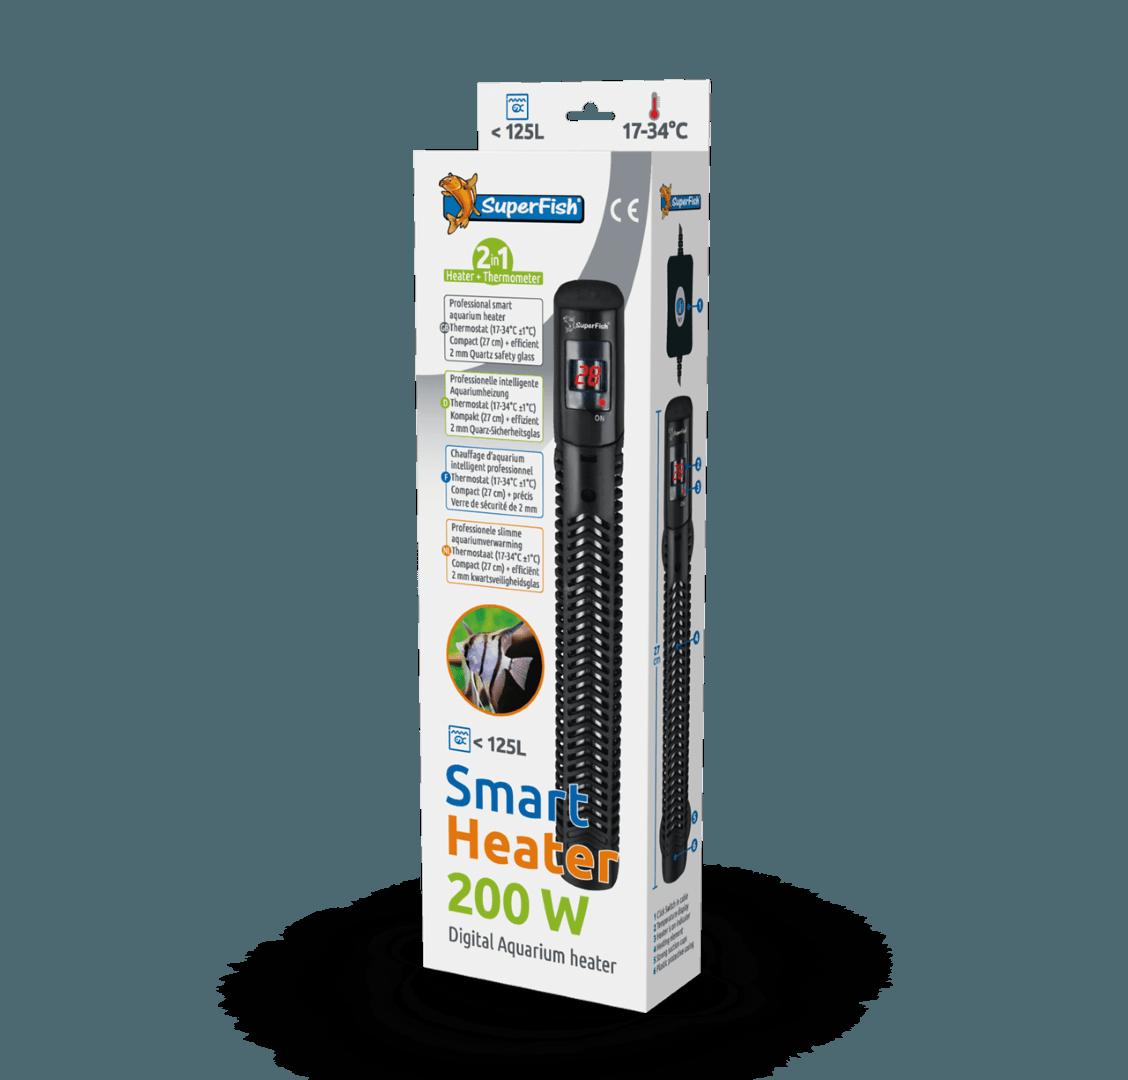 Superfish smart heater 200 watt